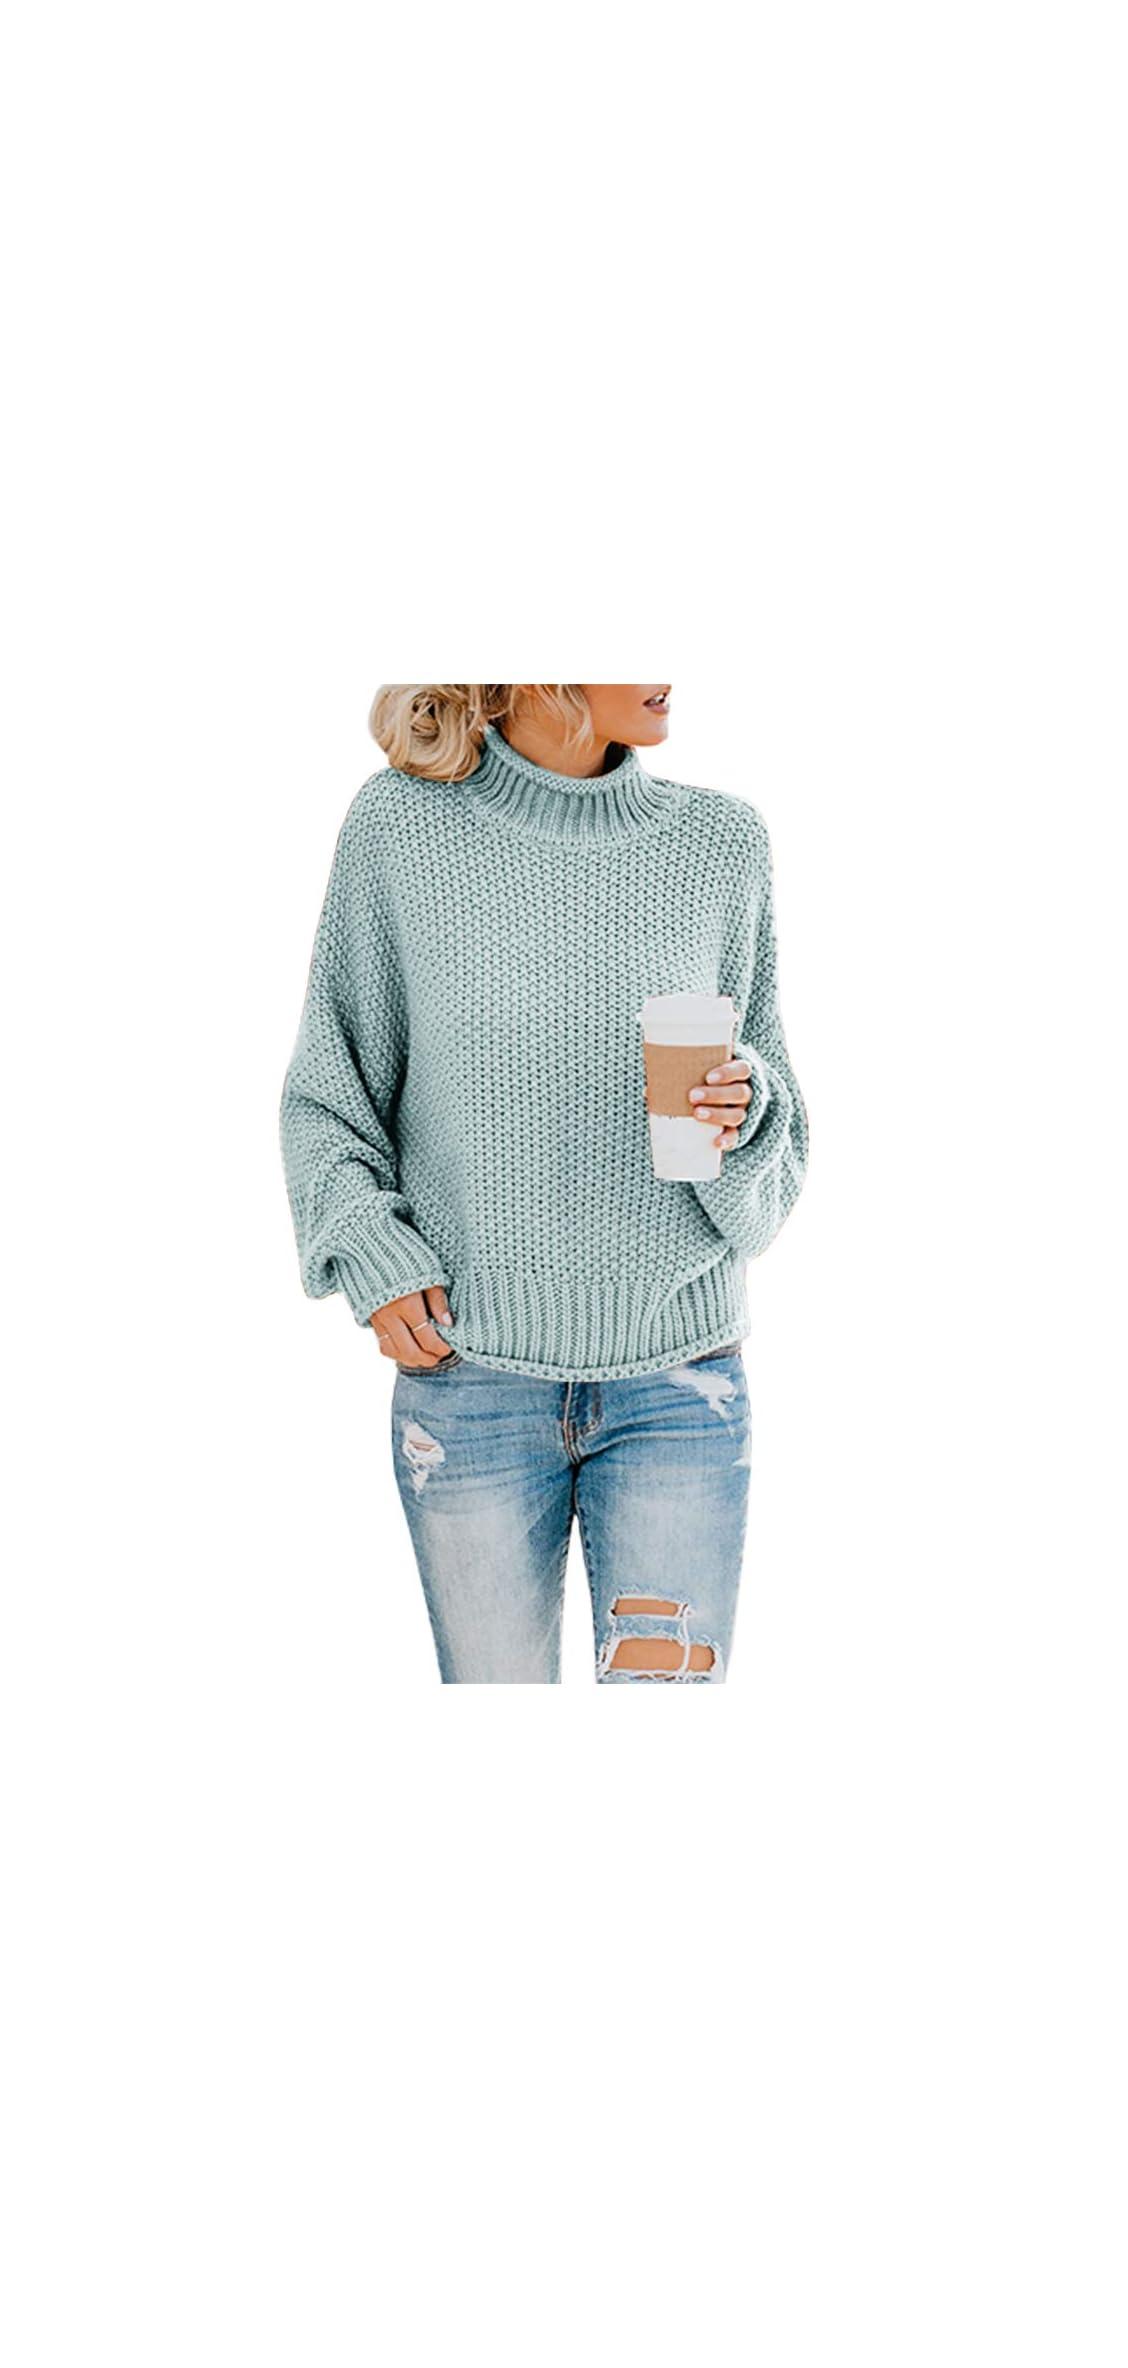 Womens Turtleneck Sweaters Oversized Chunky Batwing Long